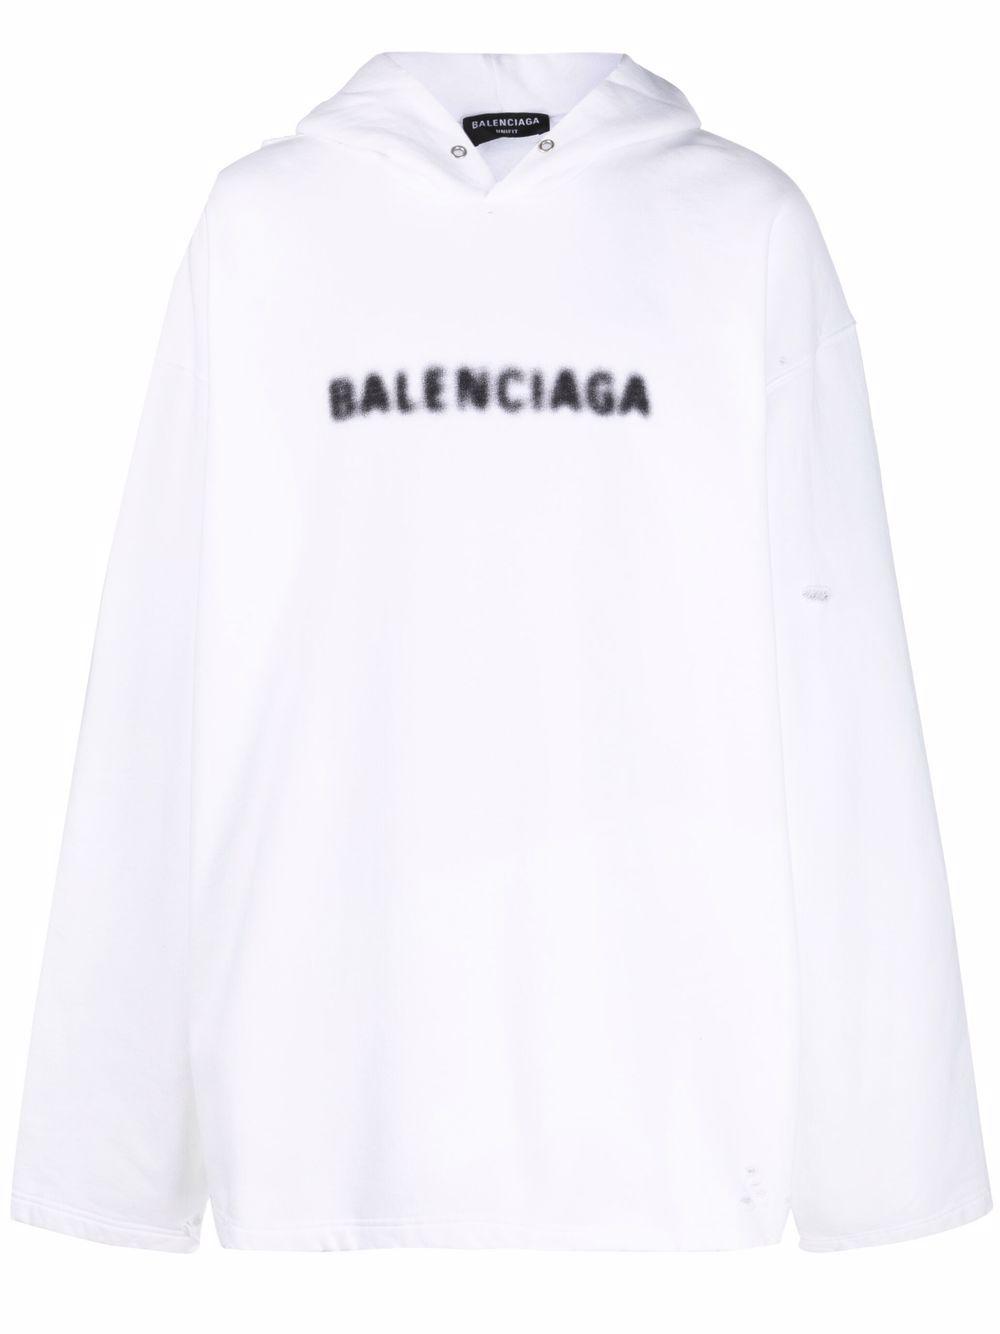 Picture of Balenciaga | Hoodie Sweatshirt